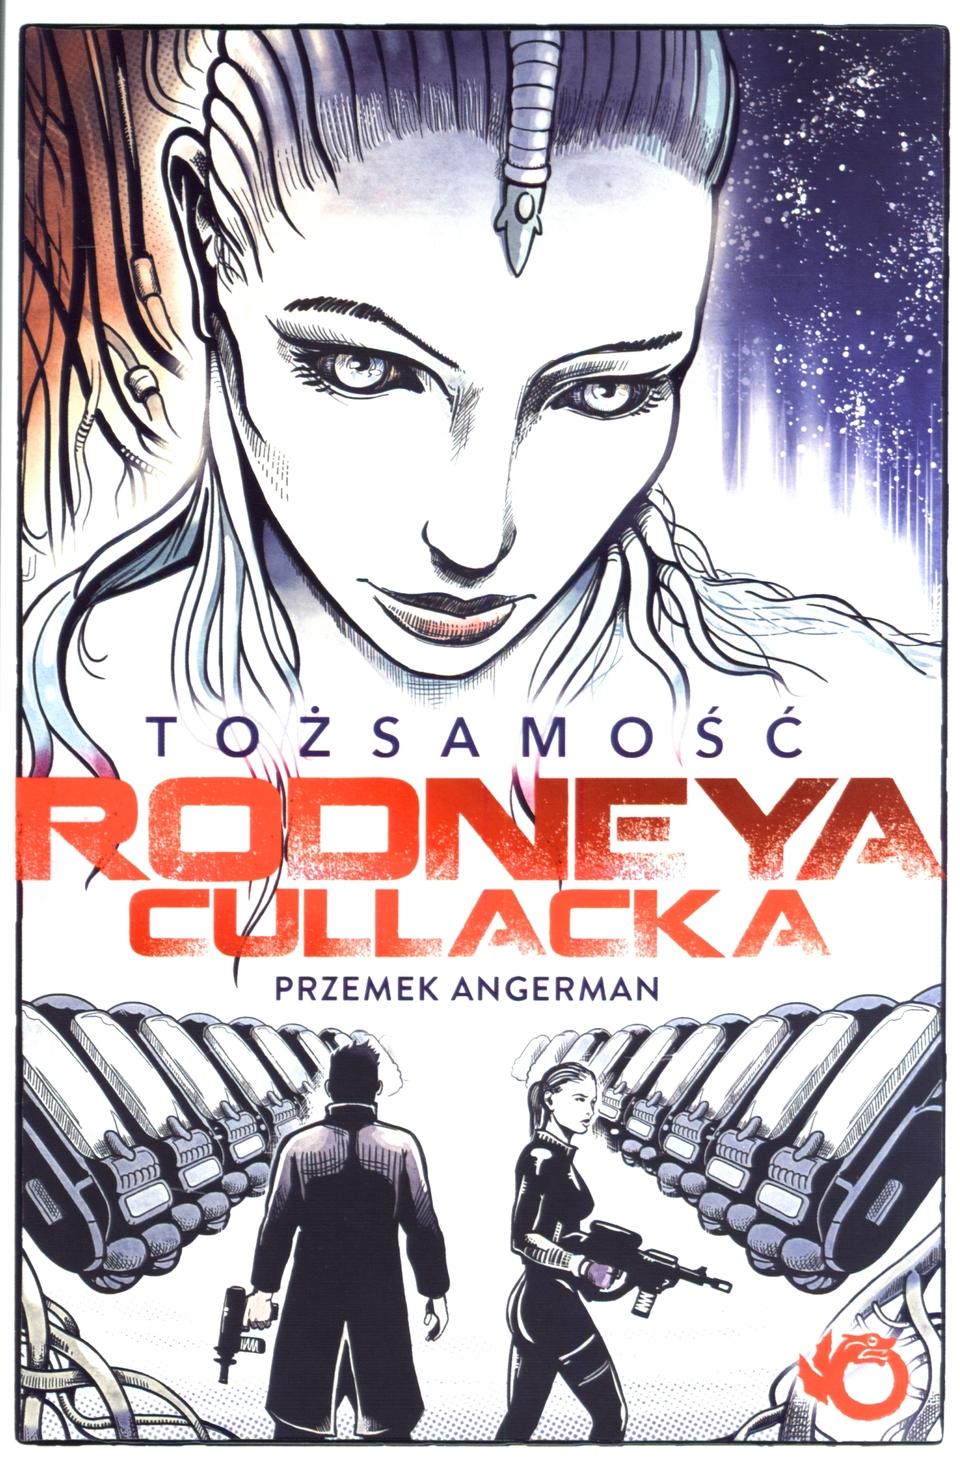 Tożsamość Rodneya Cullacka Przemek Angerman okładka